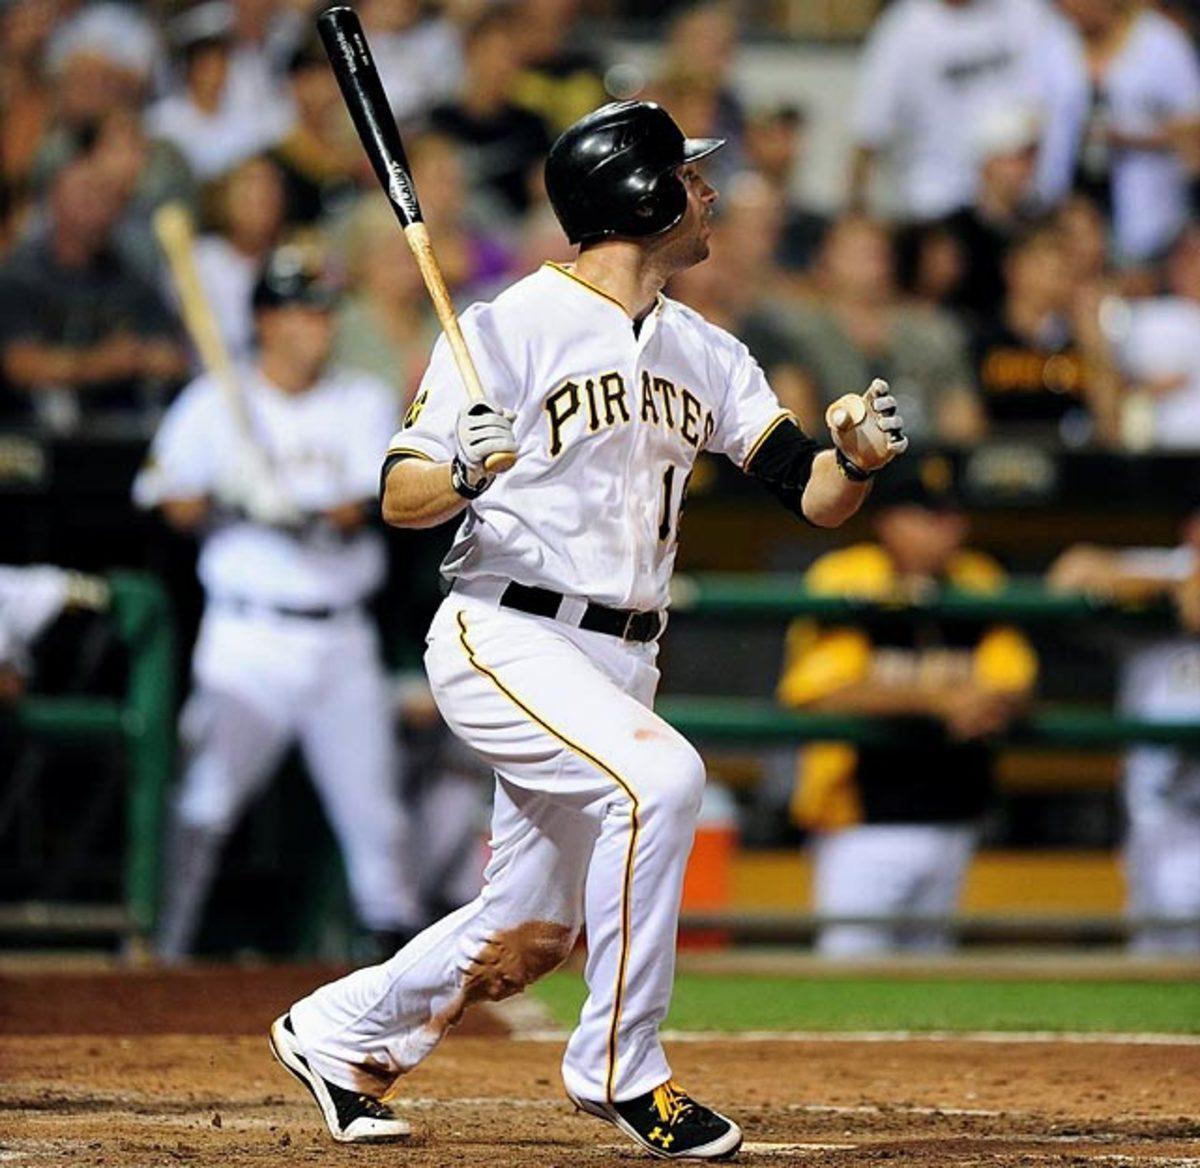 Second base: <br> Neil Walker